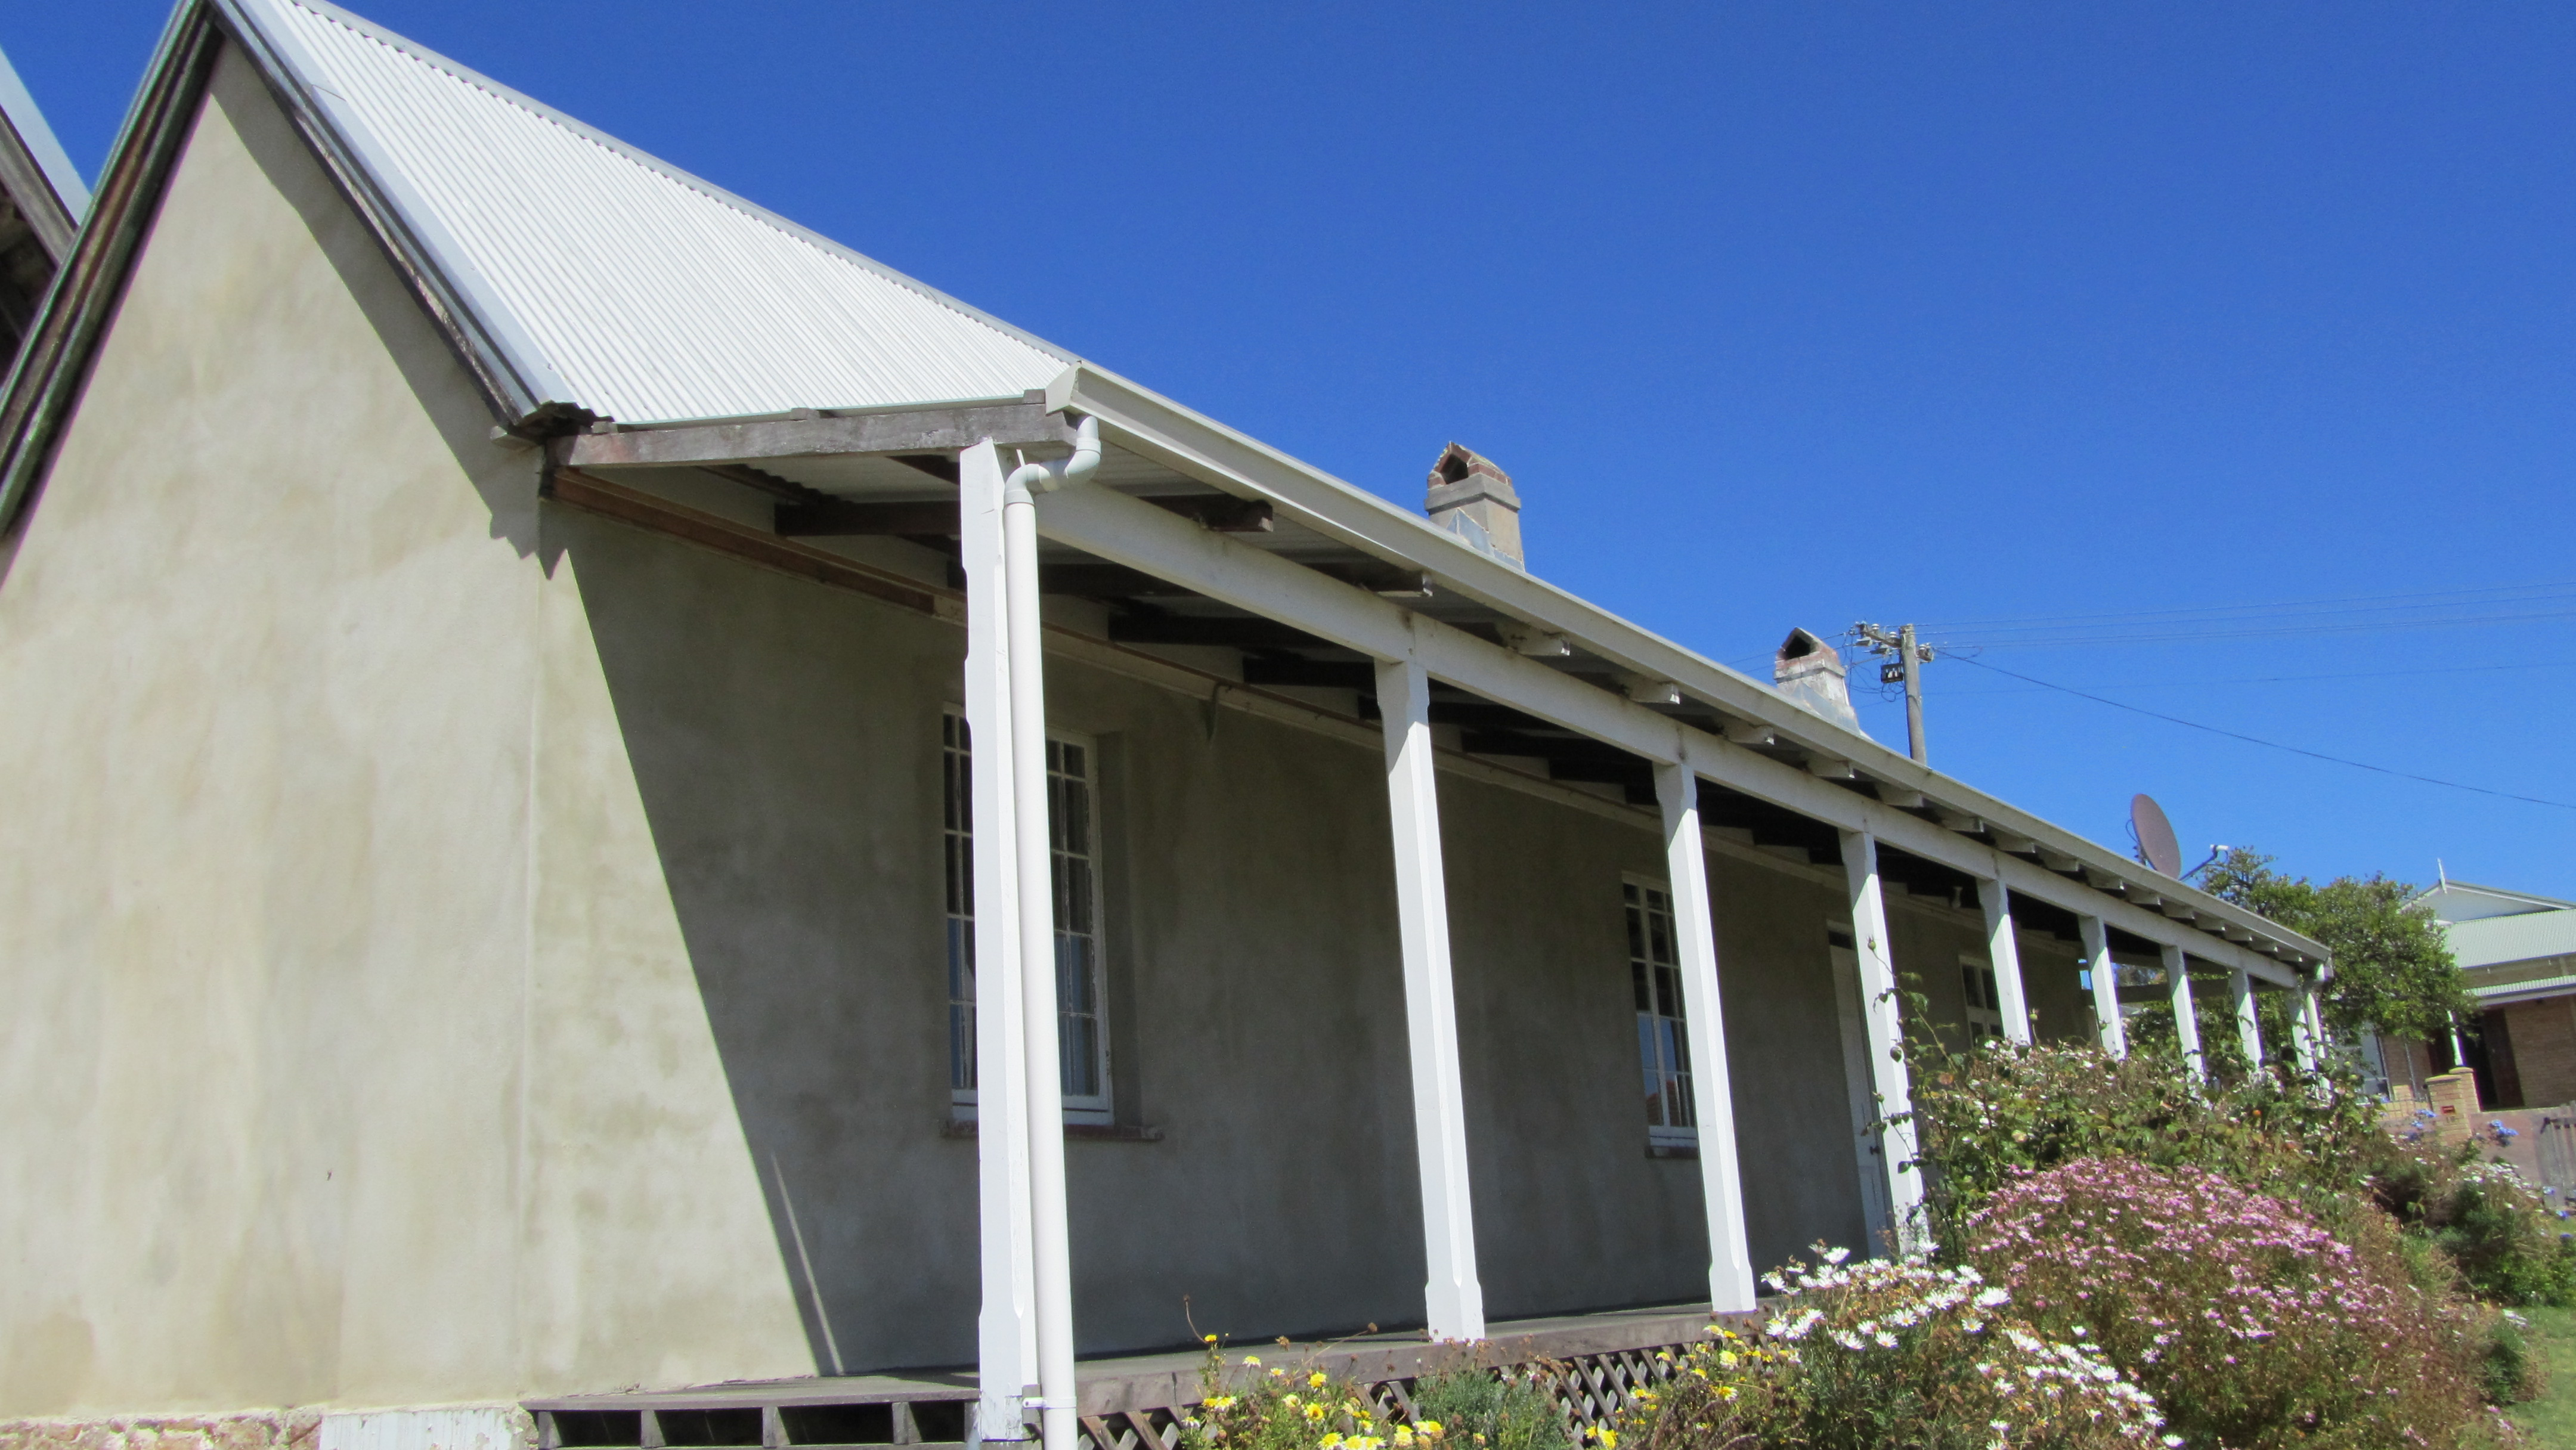 North east rear verandah